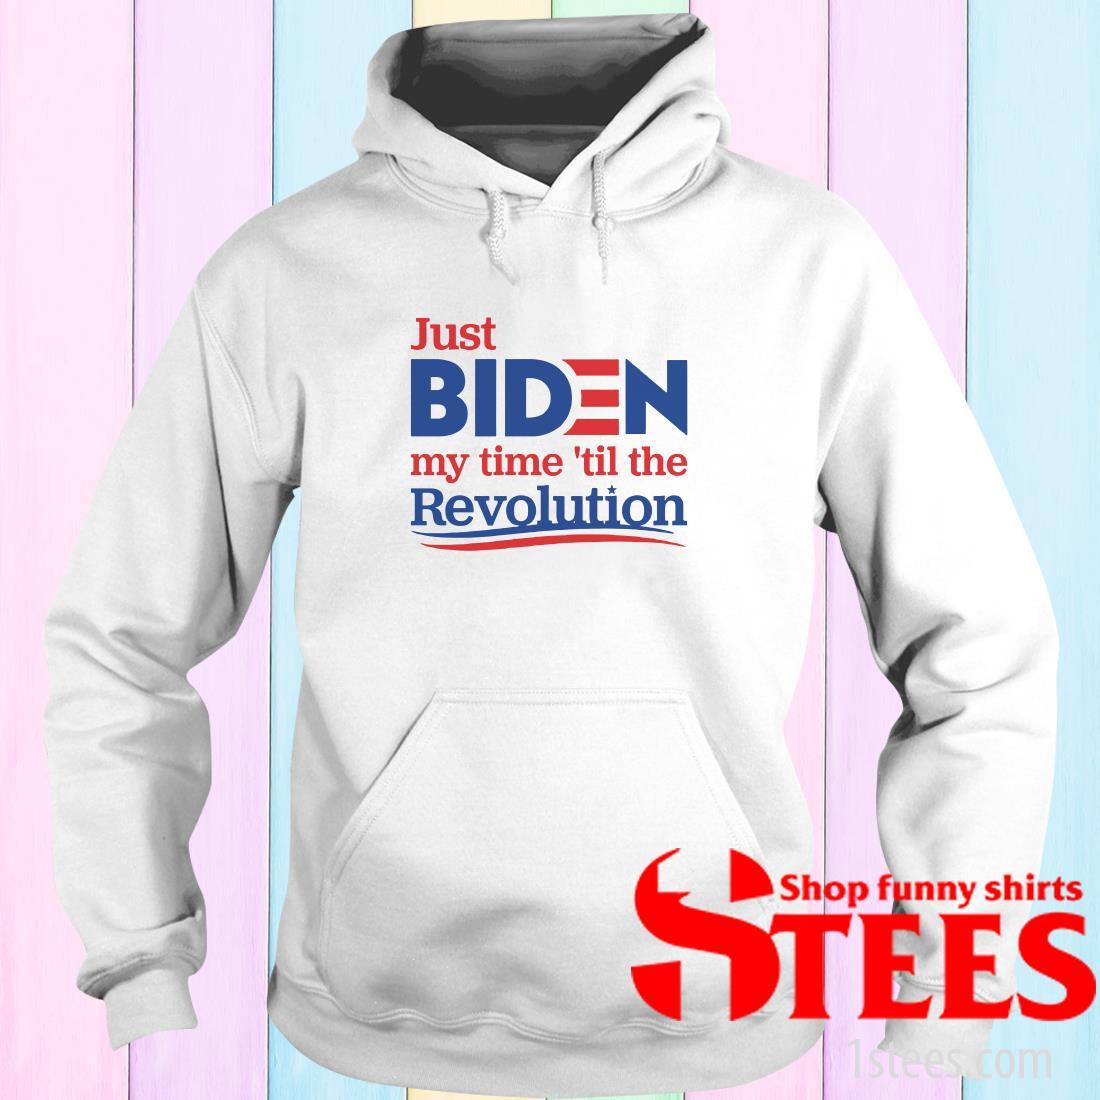 Just Biden My Time 'til The Revolution Hoodies